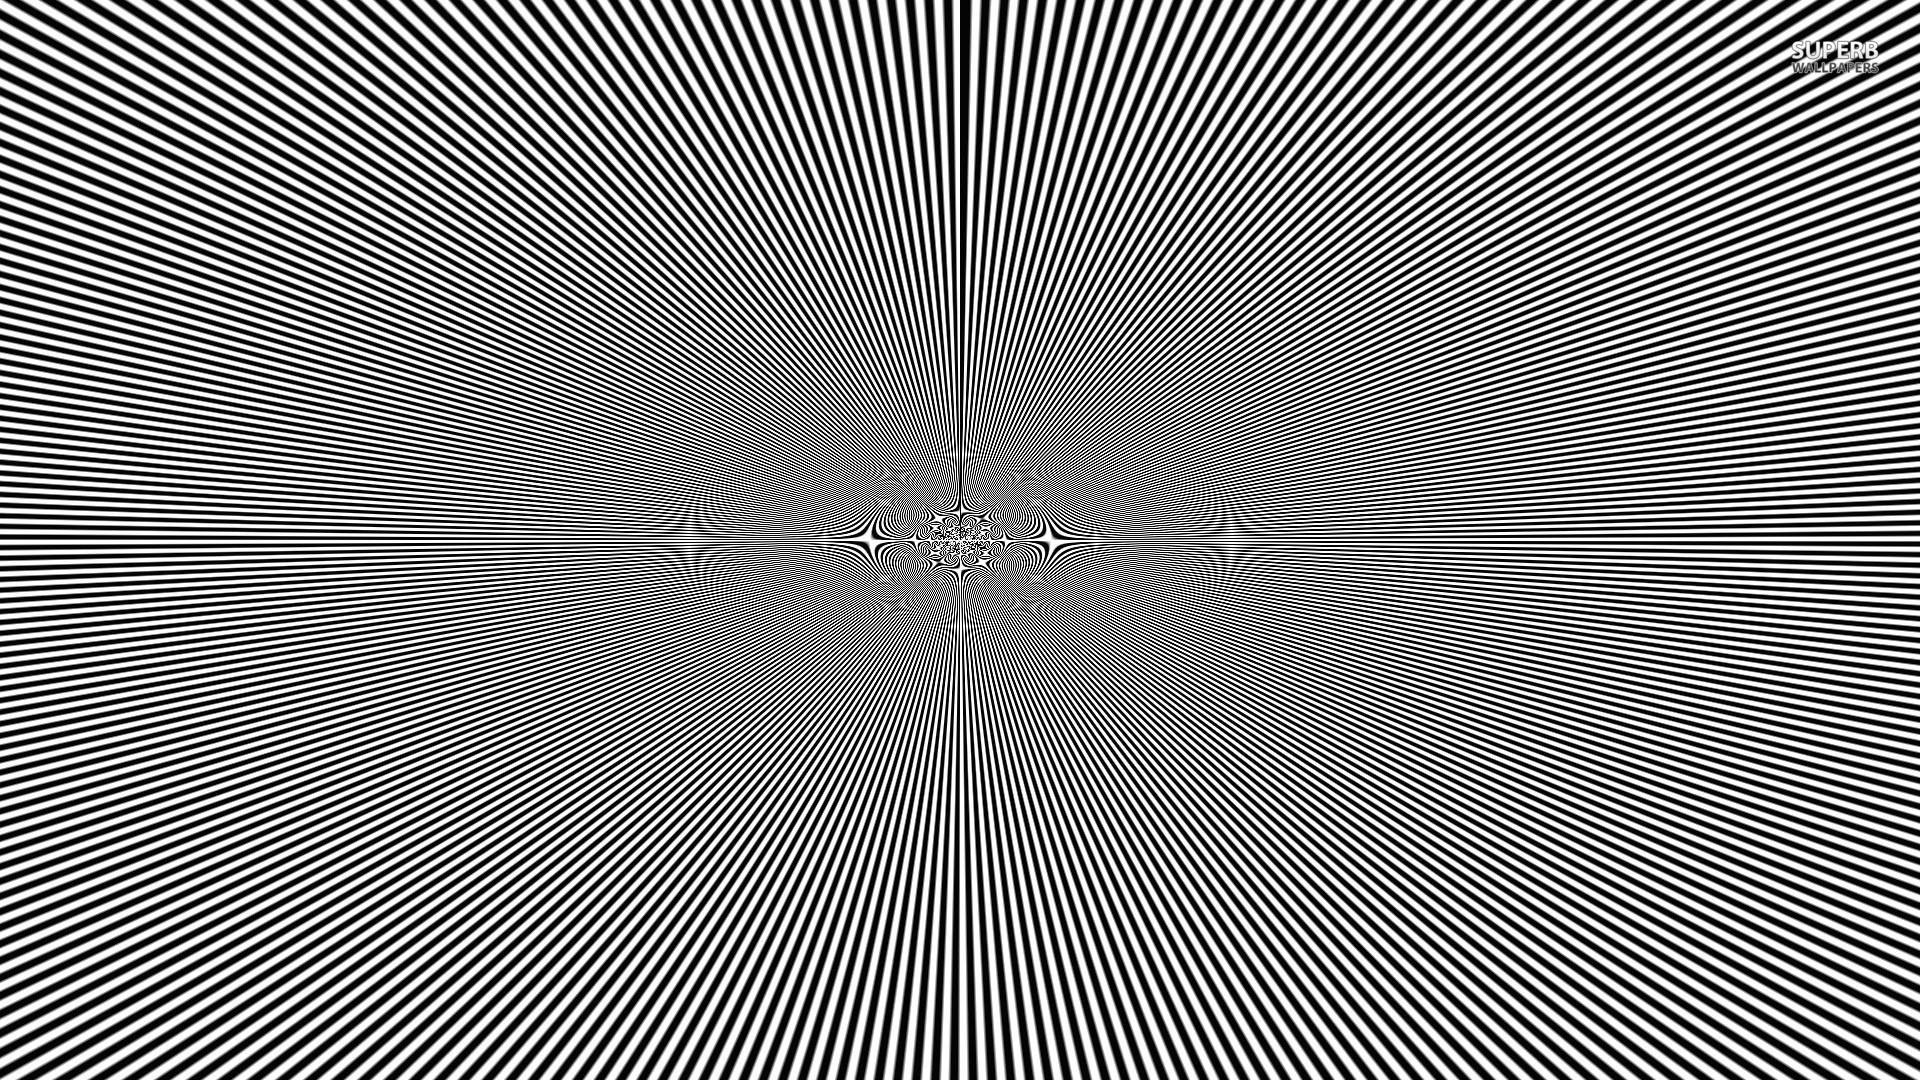 Optical Illusions Desktop Wallpapers Wallpapers